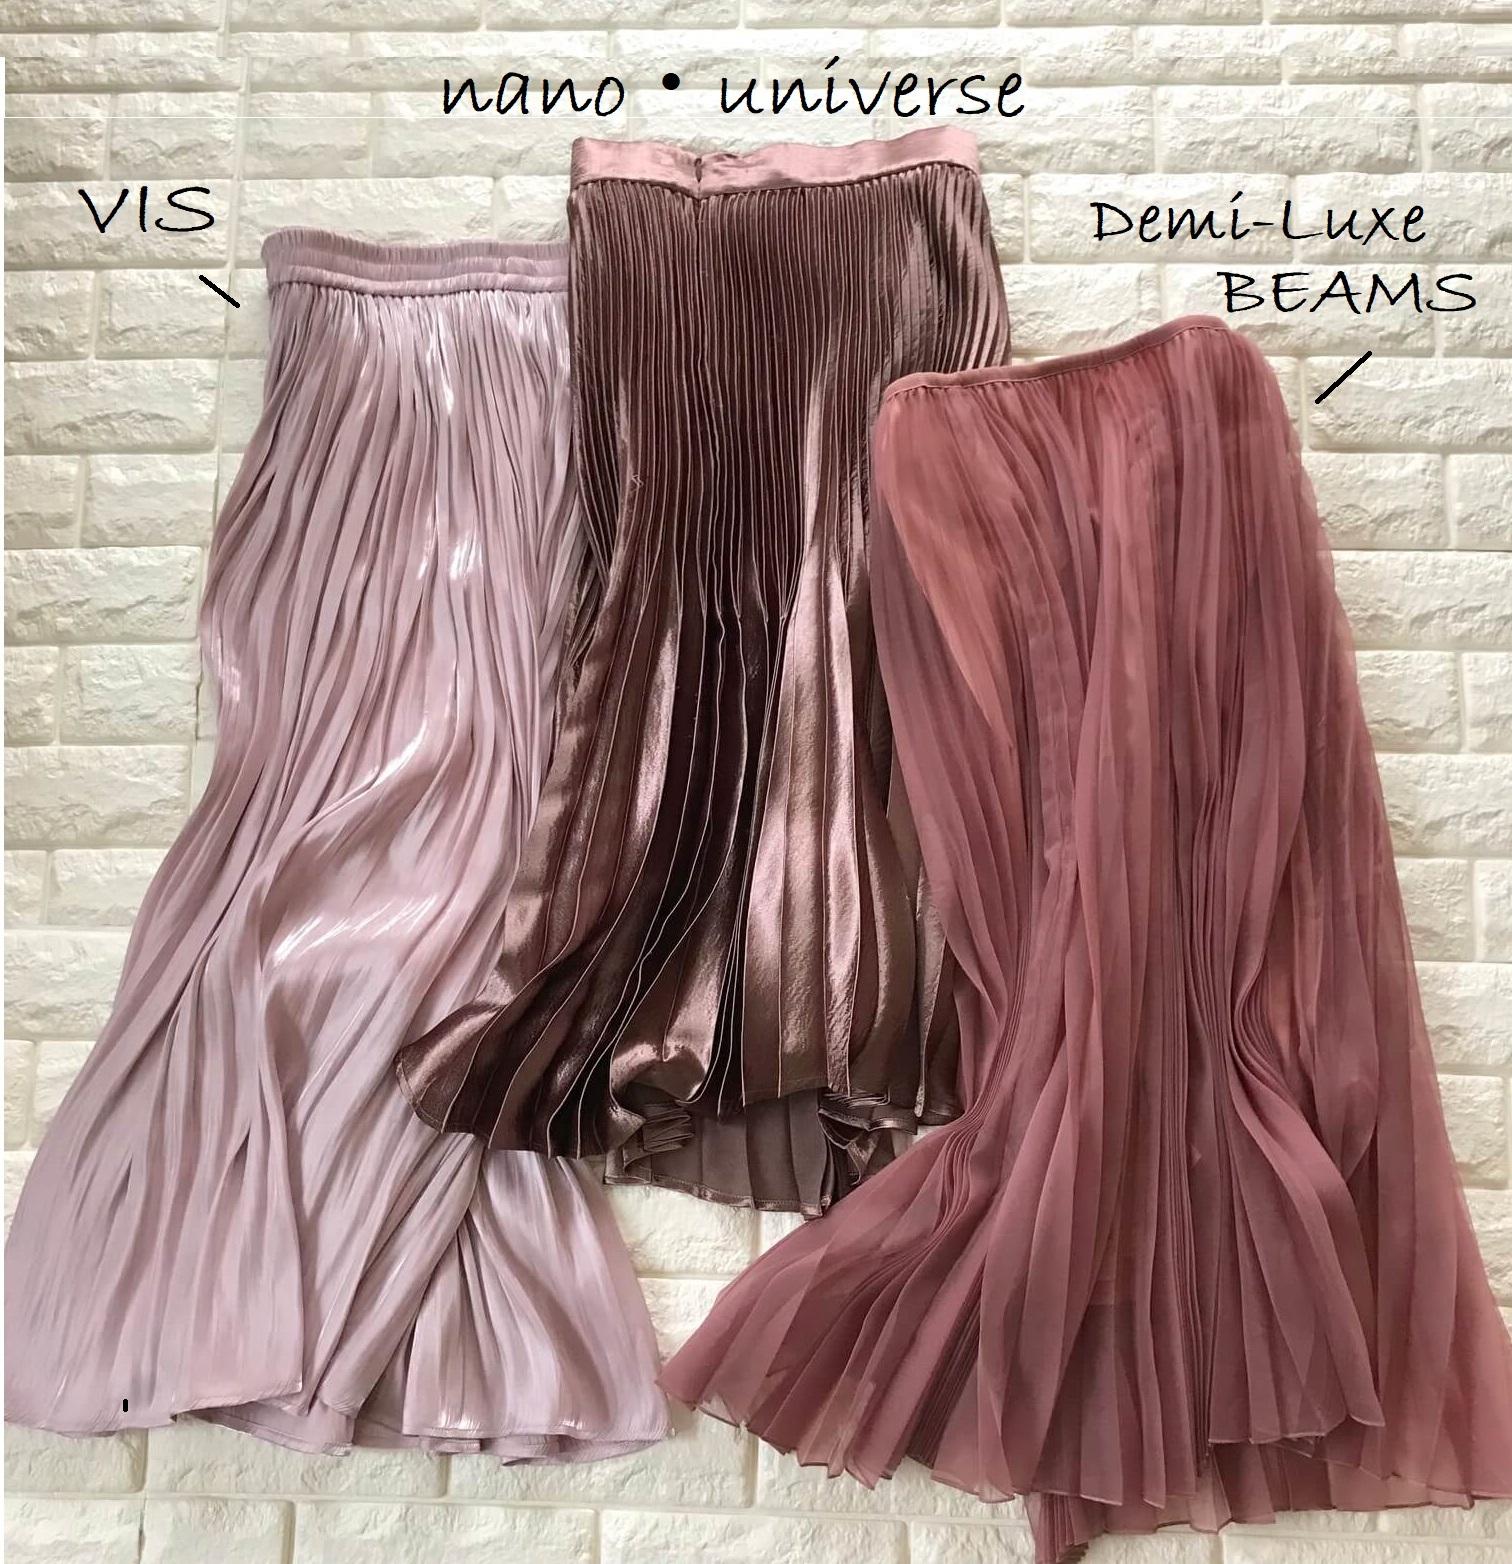 VISのピンクフレアスカートと他ピンクスカート2点のセット画像